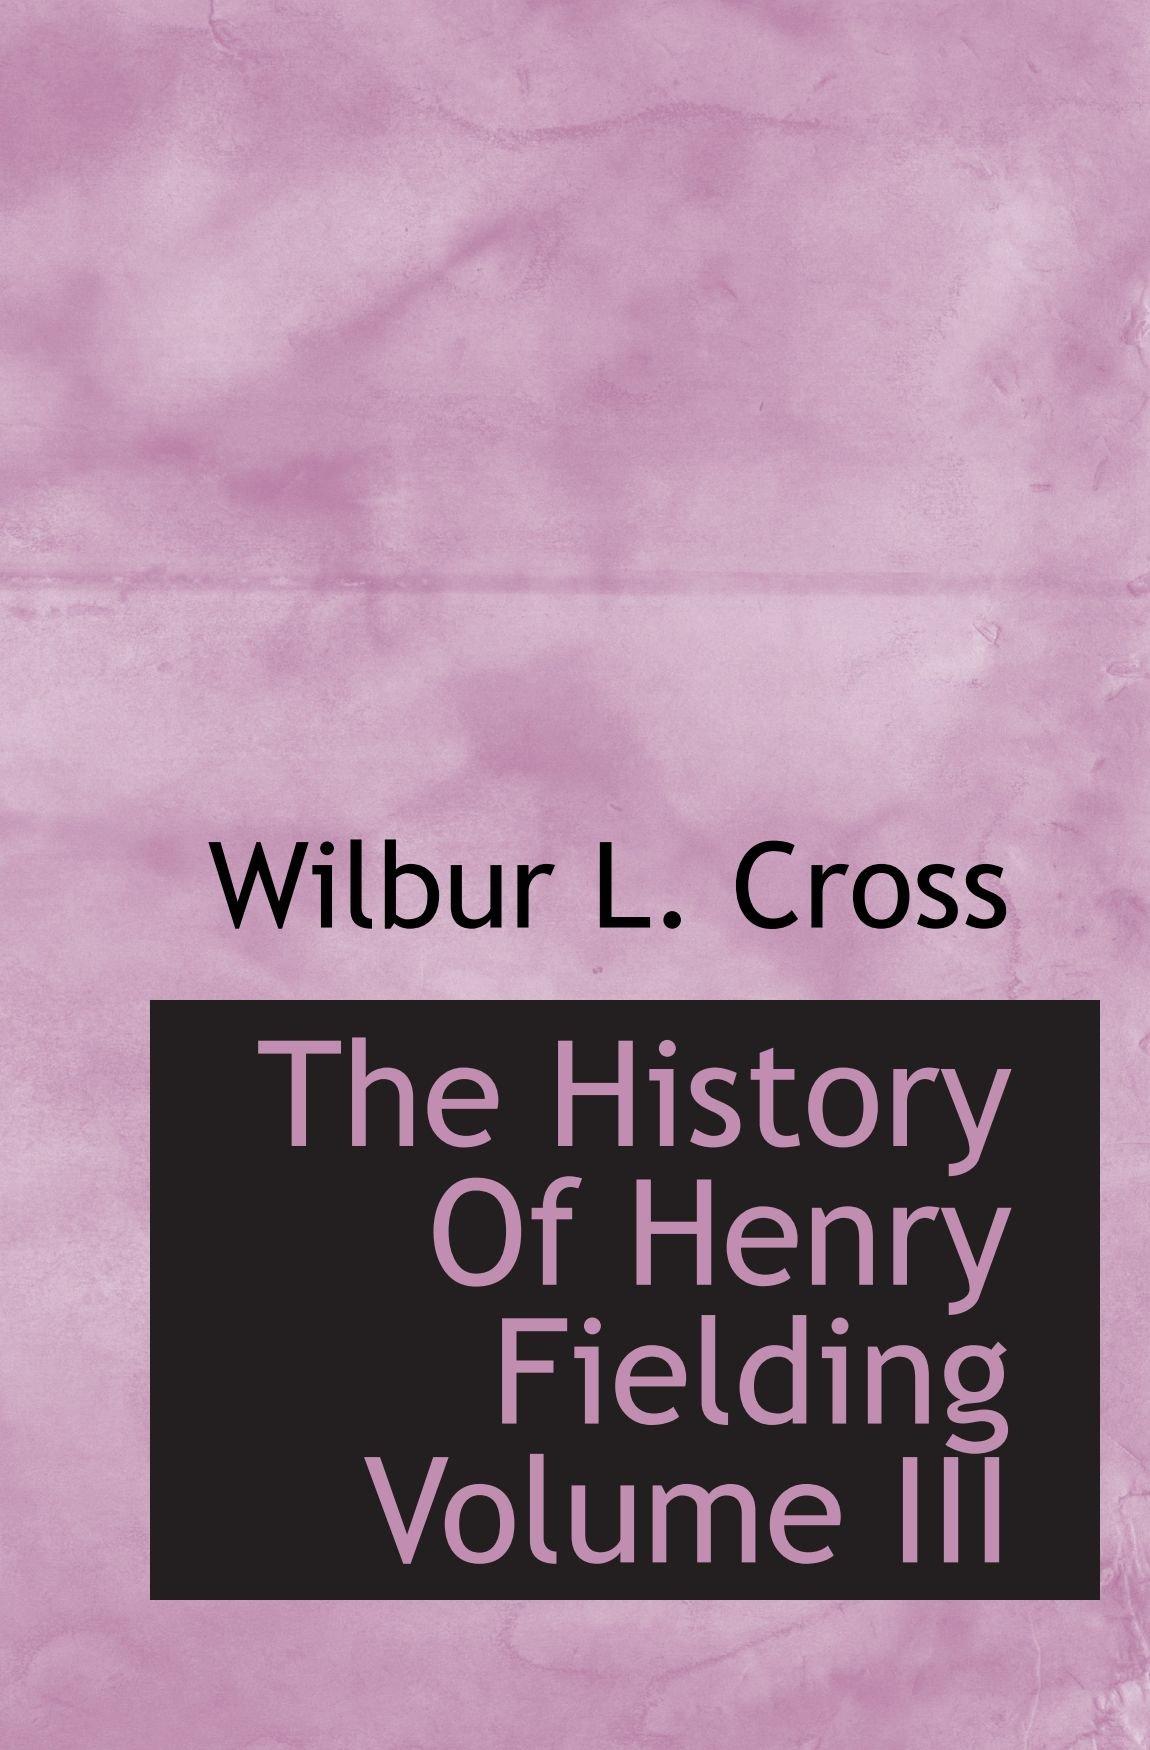 The History Of Henry Fielding Volume III PDF